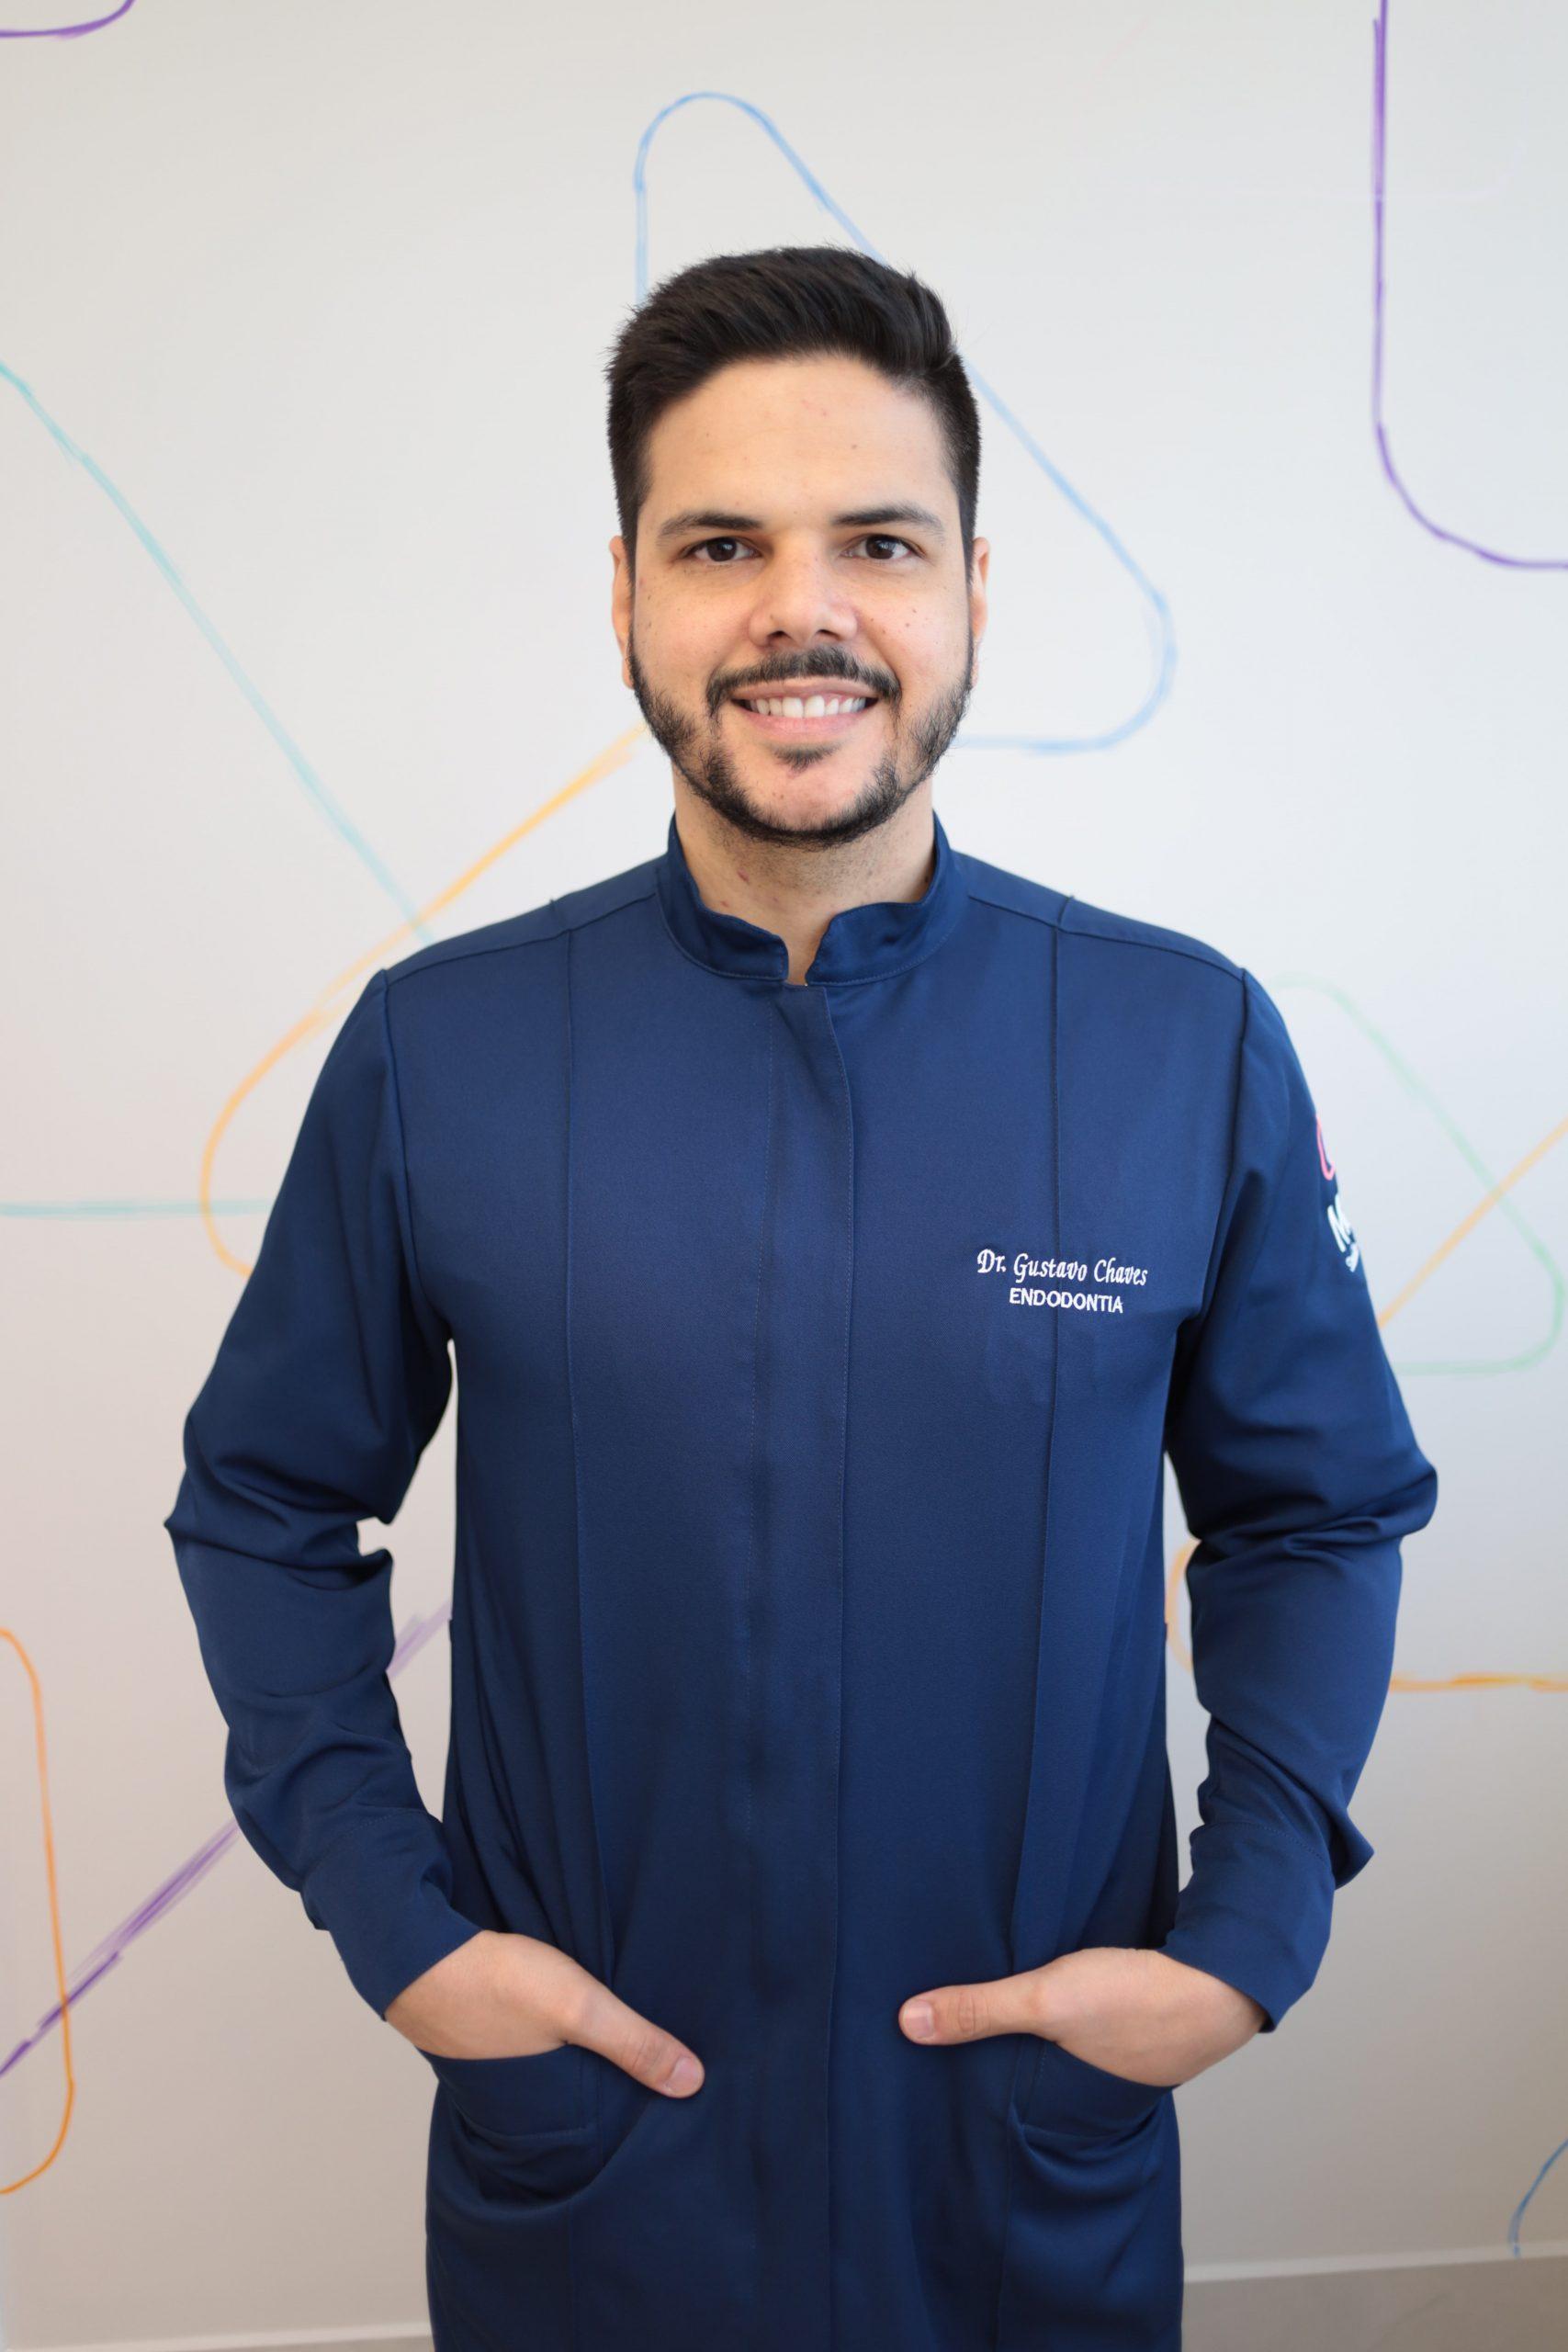 Gustavo Chaves